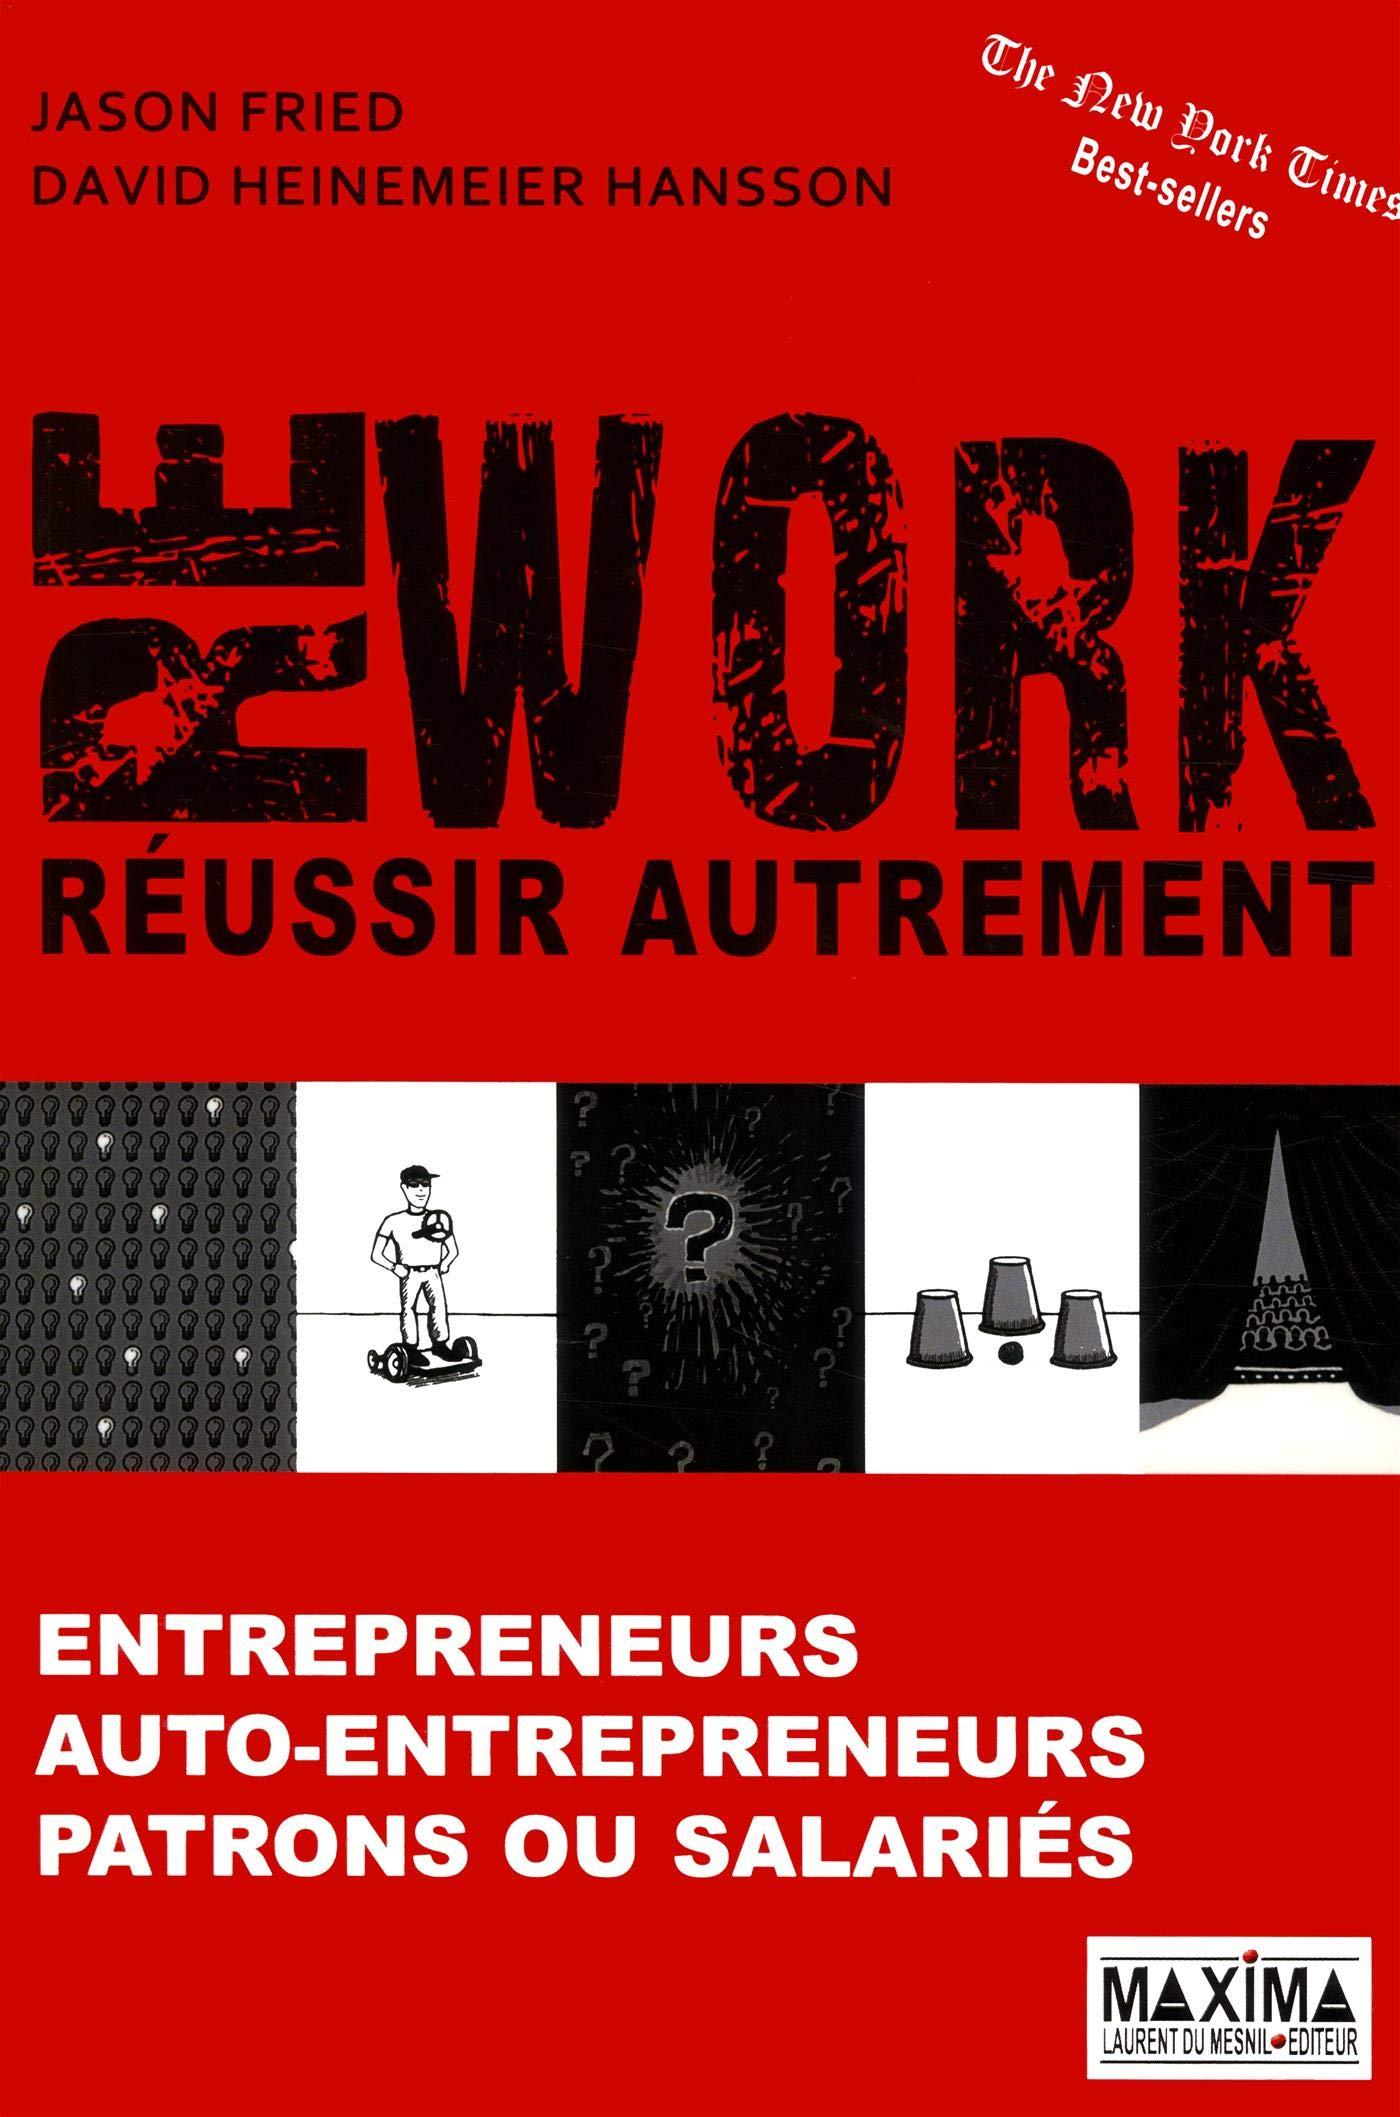 REWORK : REUSSIR AUTREMENT Broché – 8 mars 2012 Jason Fried David heinemeier Hansson Maxima Laurent du Mesnil 284001713X